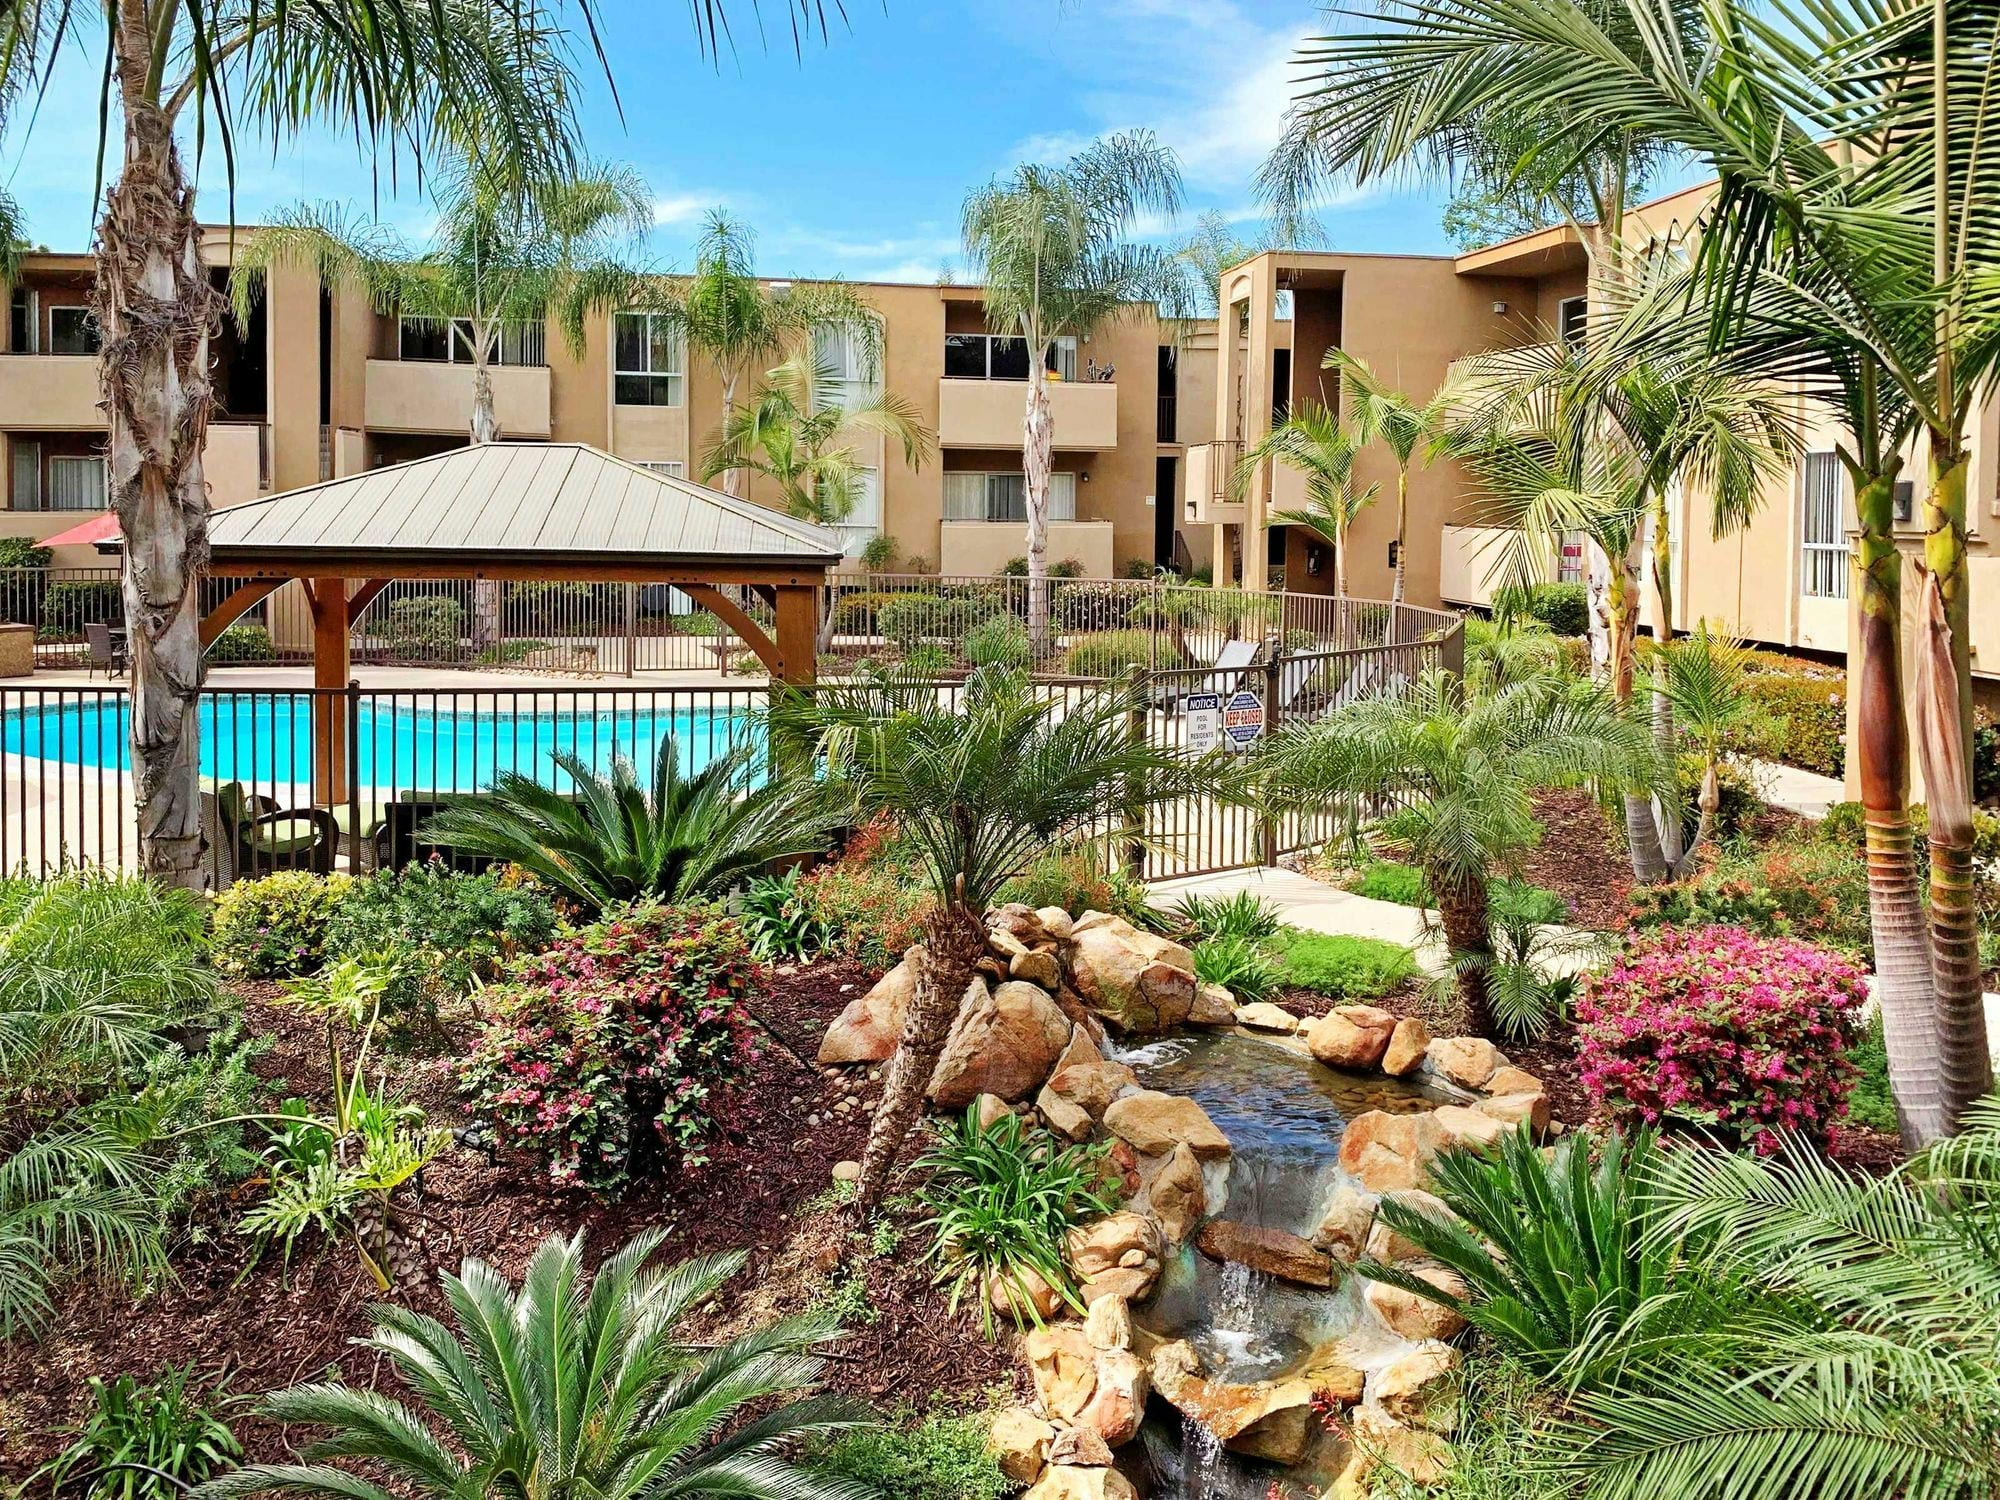 Dorchester Apartments - San Diego, CA Apartments for rent